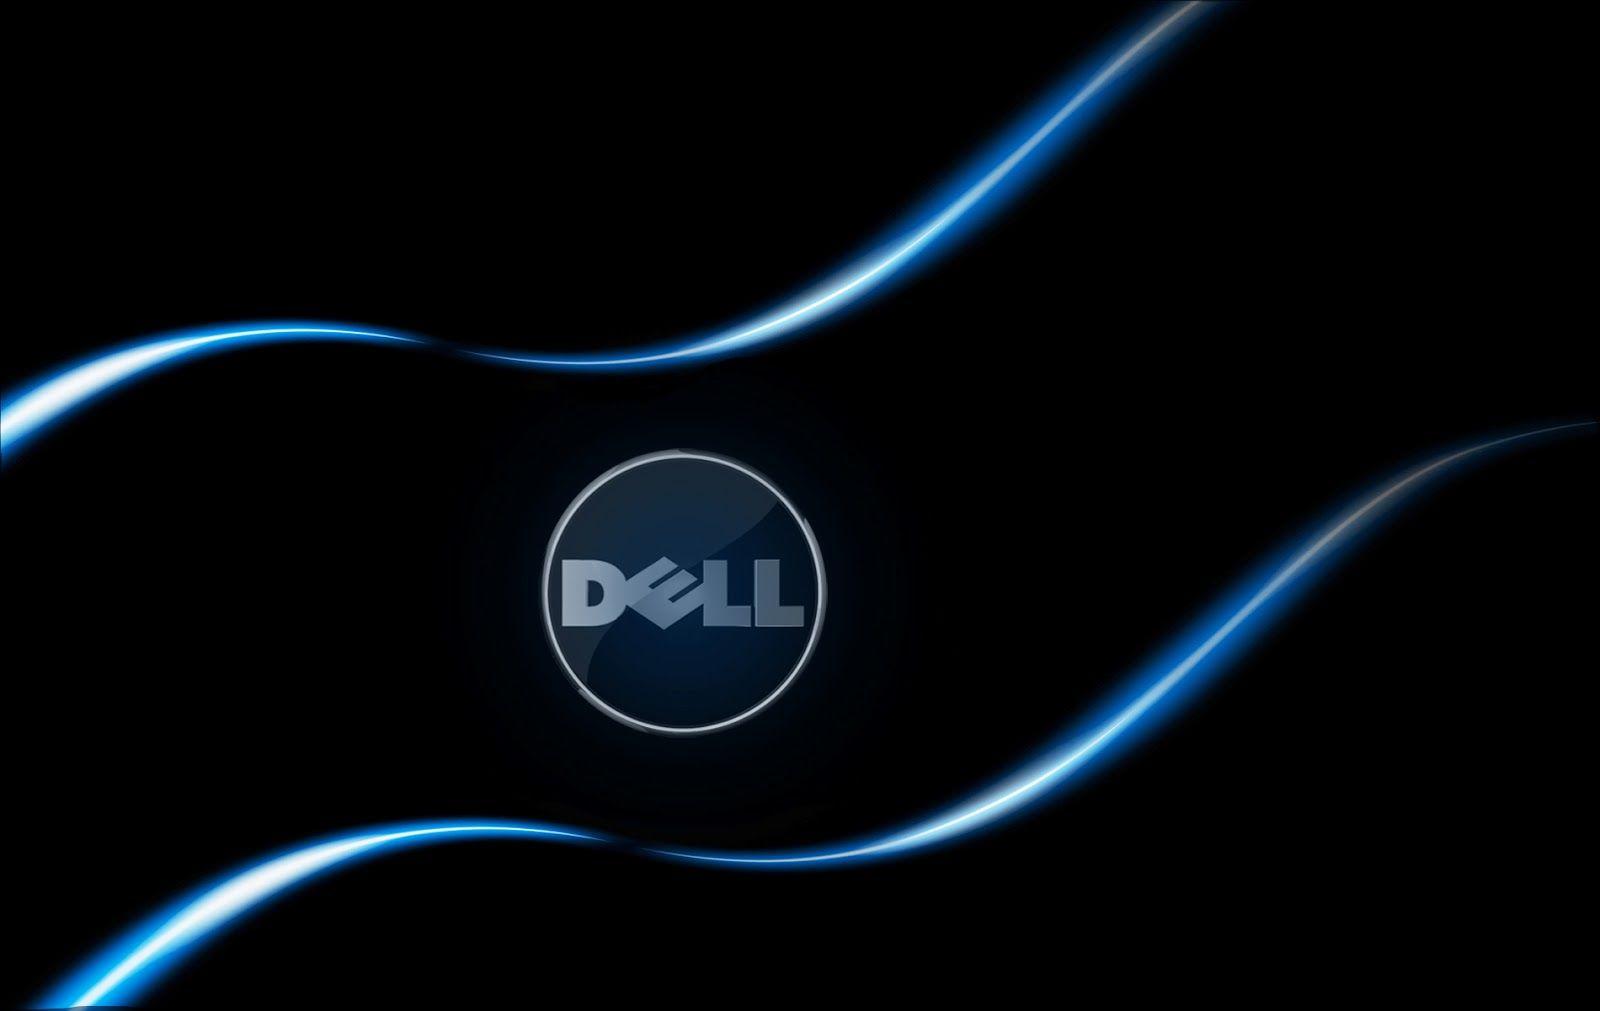 Dell Xp Desktop Wallpaper Dell Hd Backgrounds Laptop Wallpaper Hype Wallpaper Wallpaper